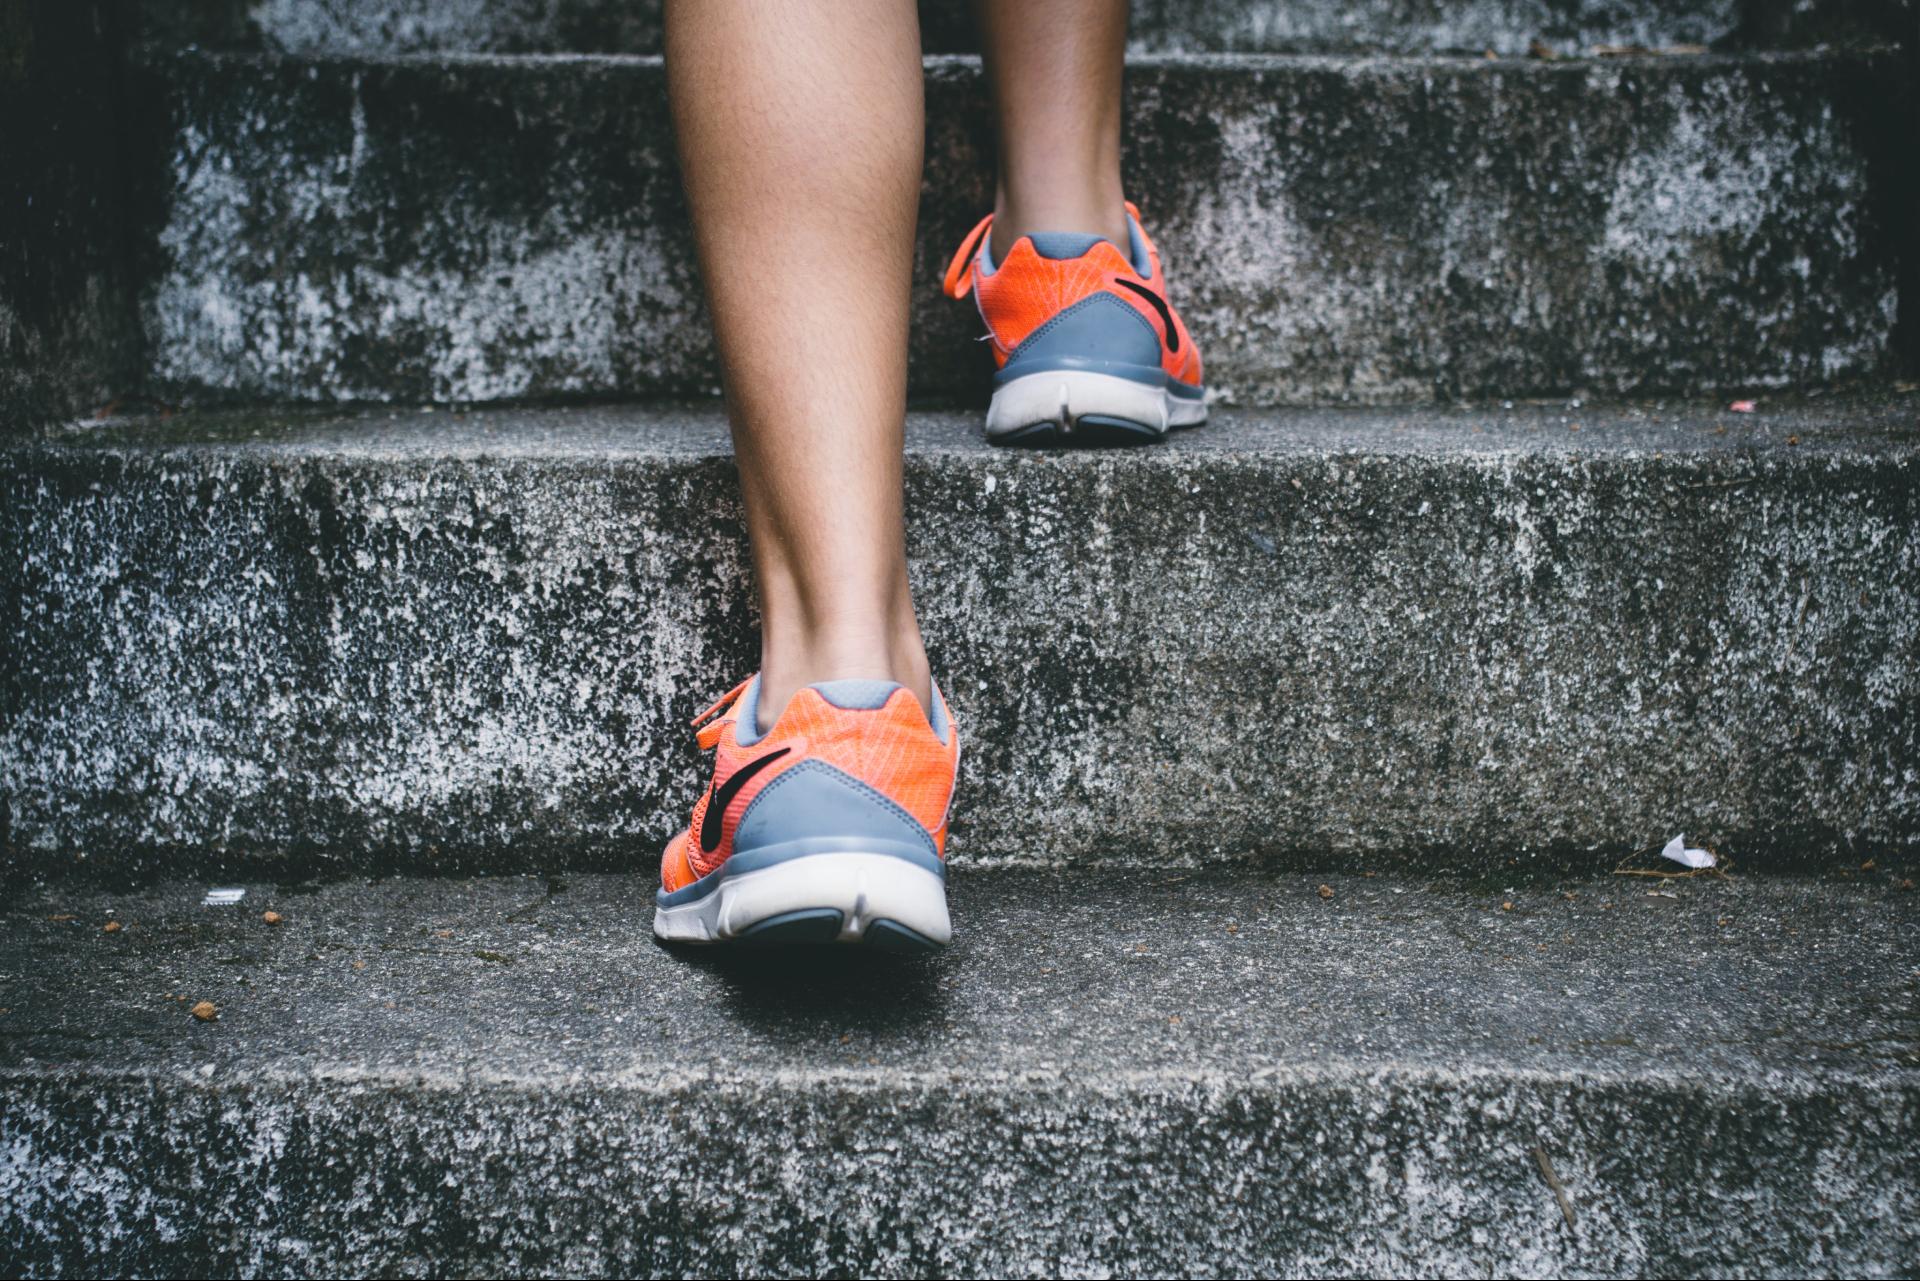 Agile steps